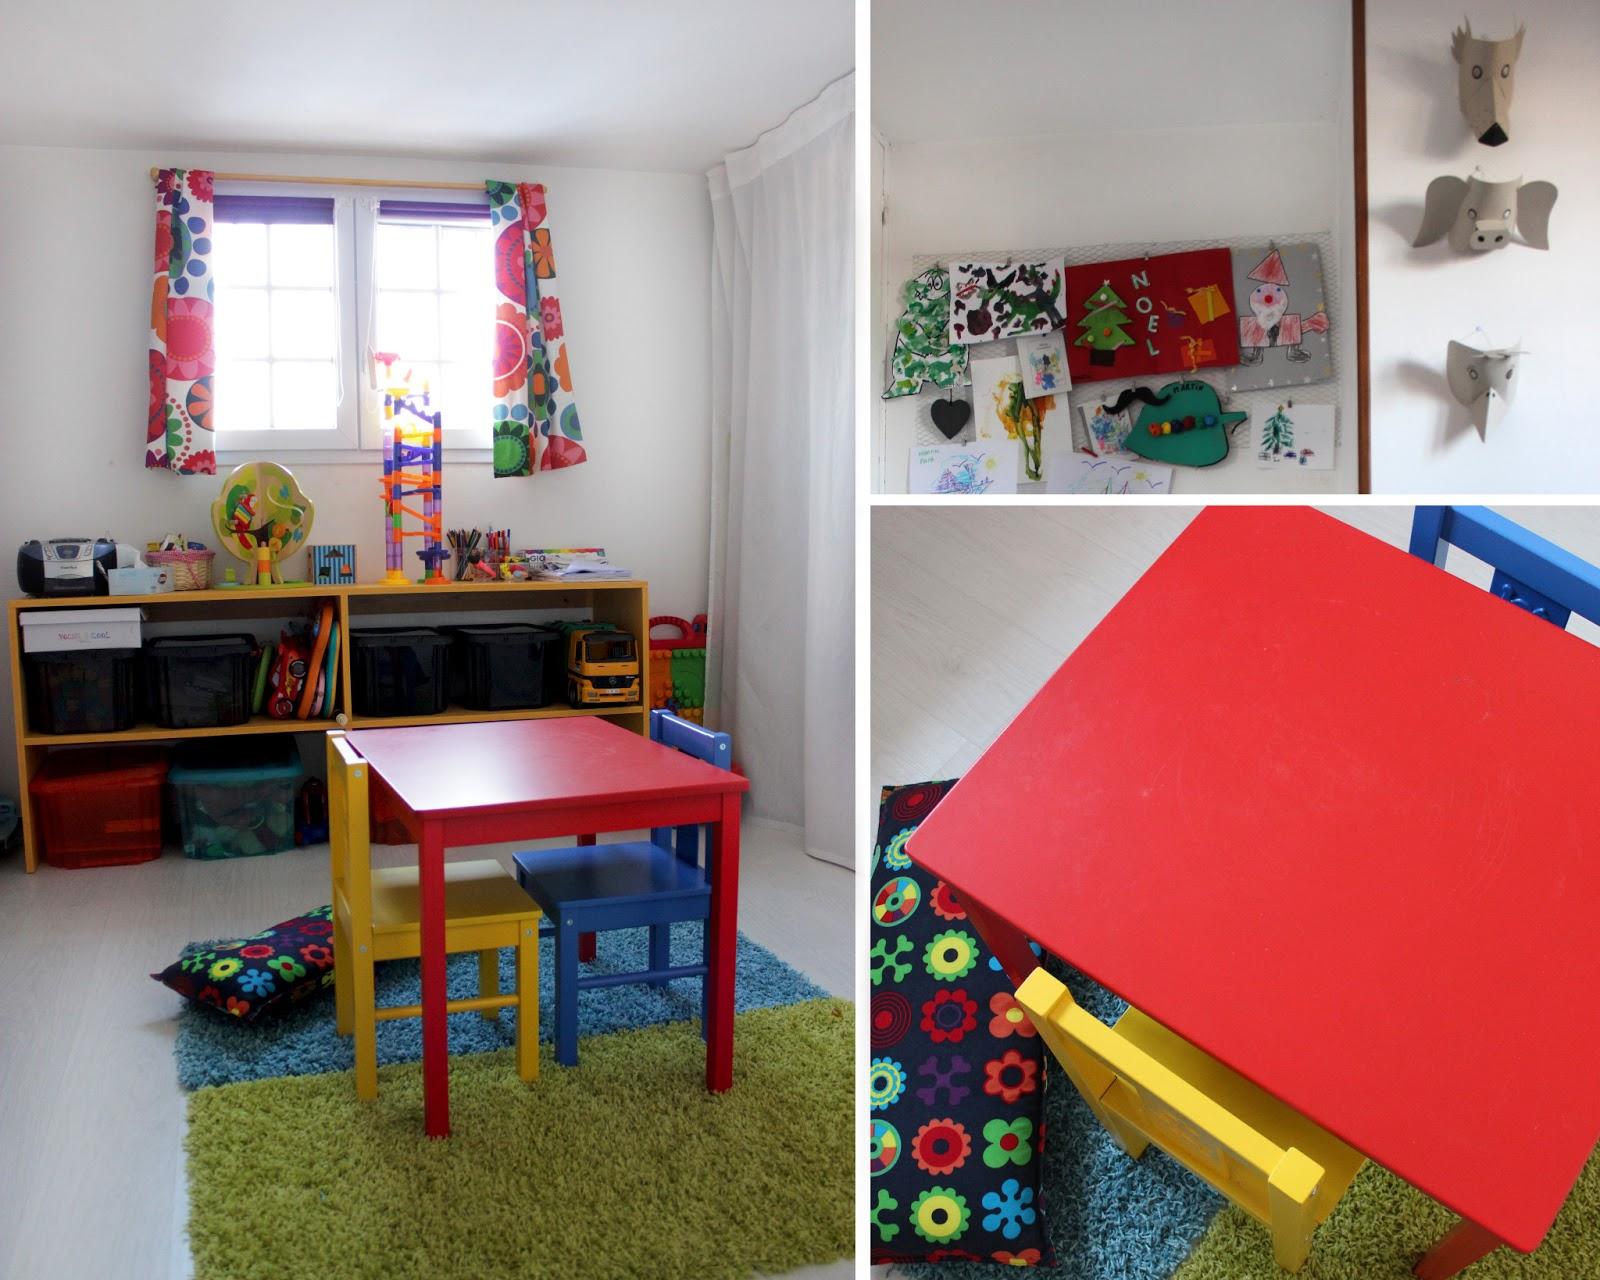 amenager une veranda en salle de jeux. Black Bedroom Furniture Sets. Home Design Ideas